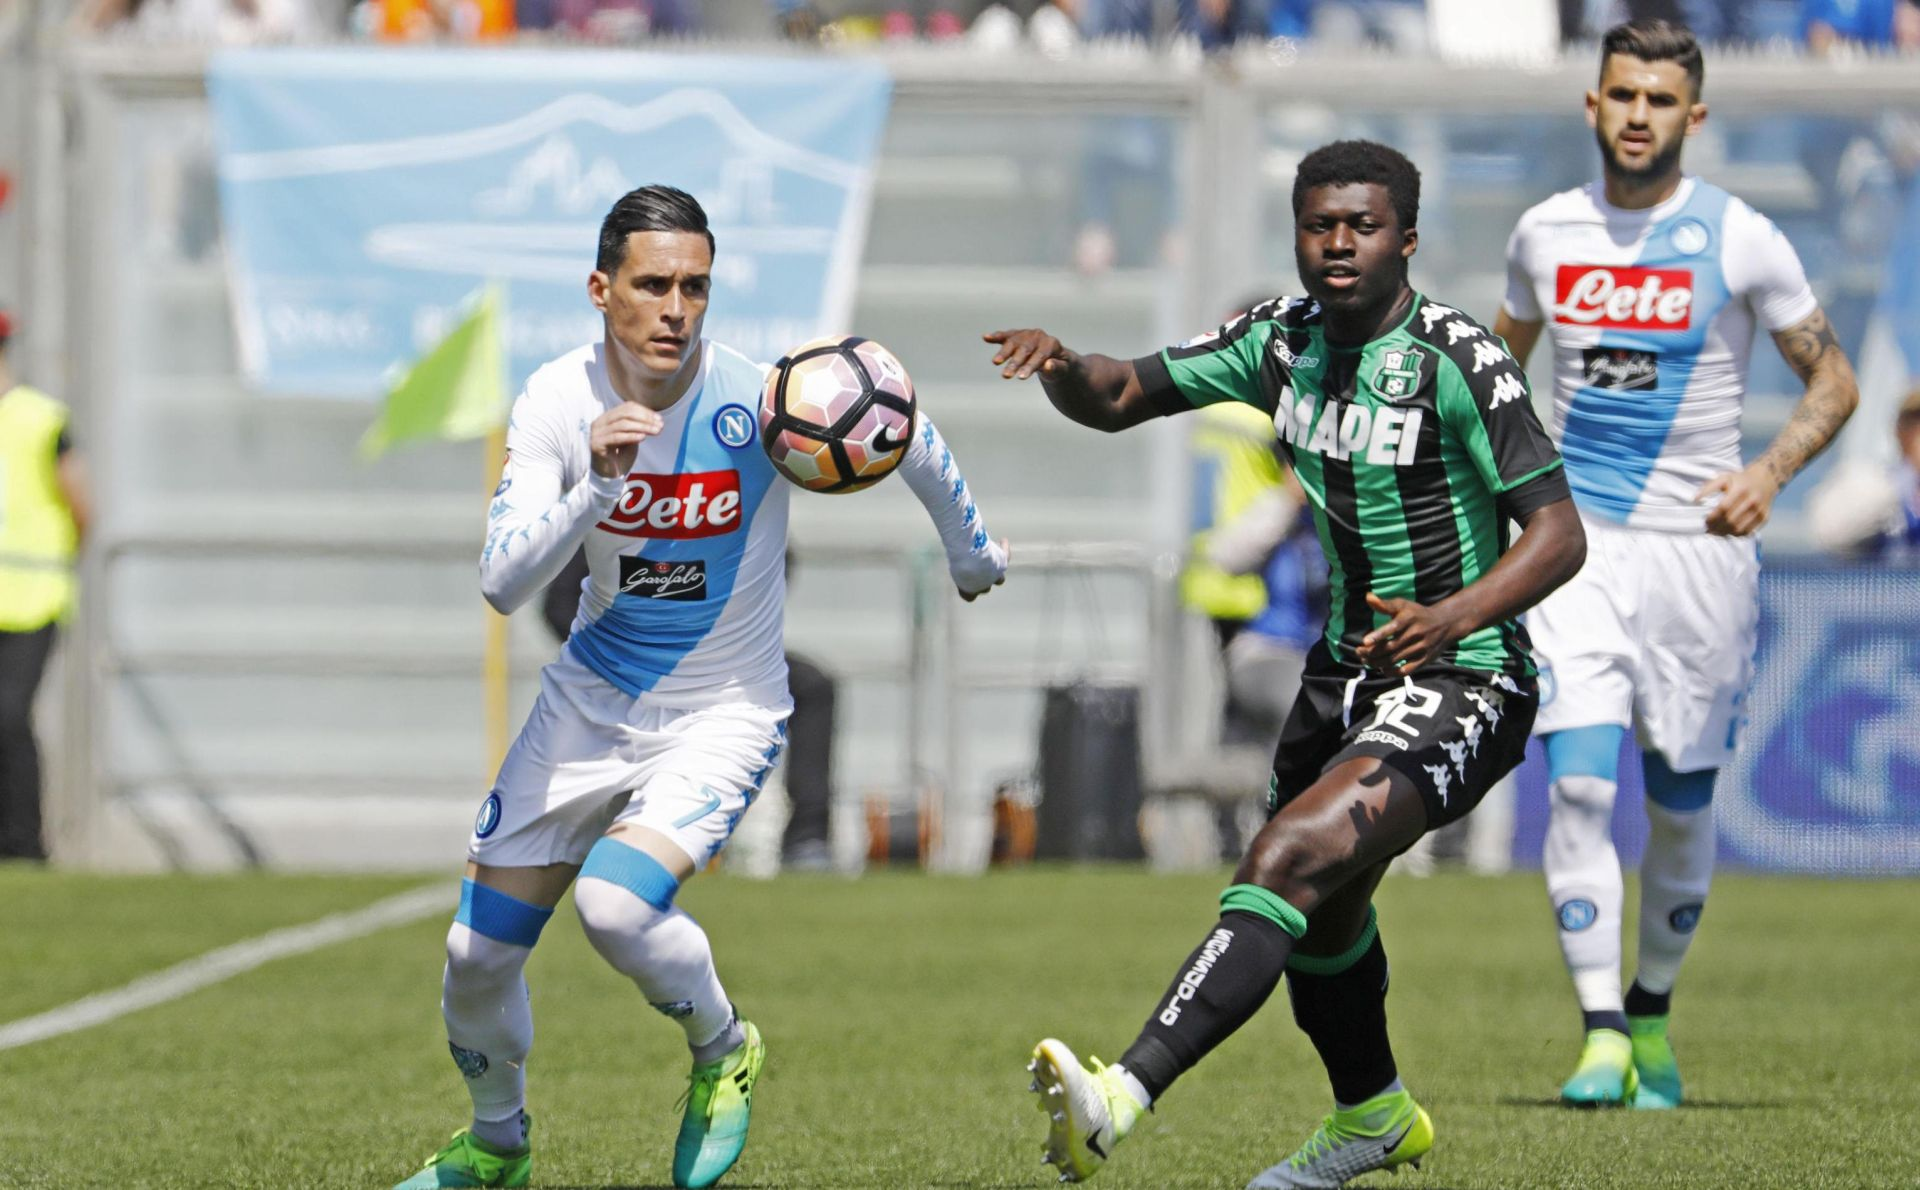 ITALIJA Sassuolo – Napoli 2-2